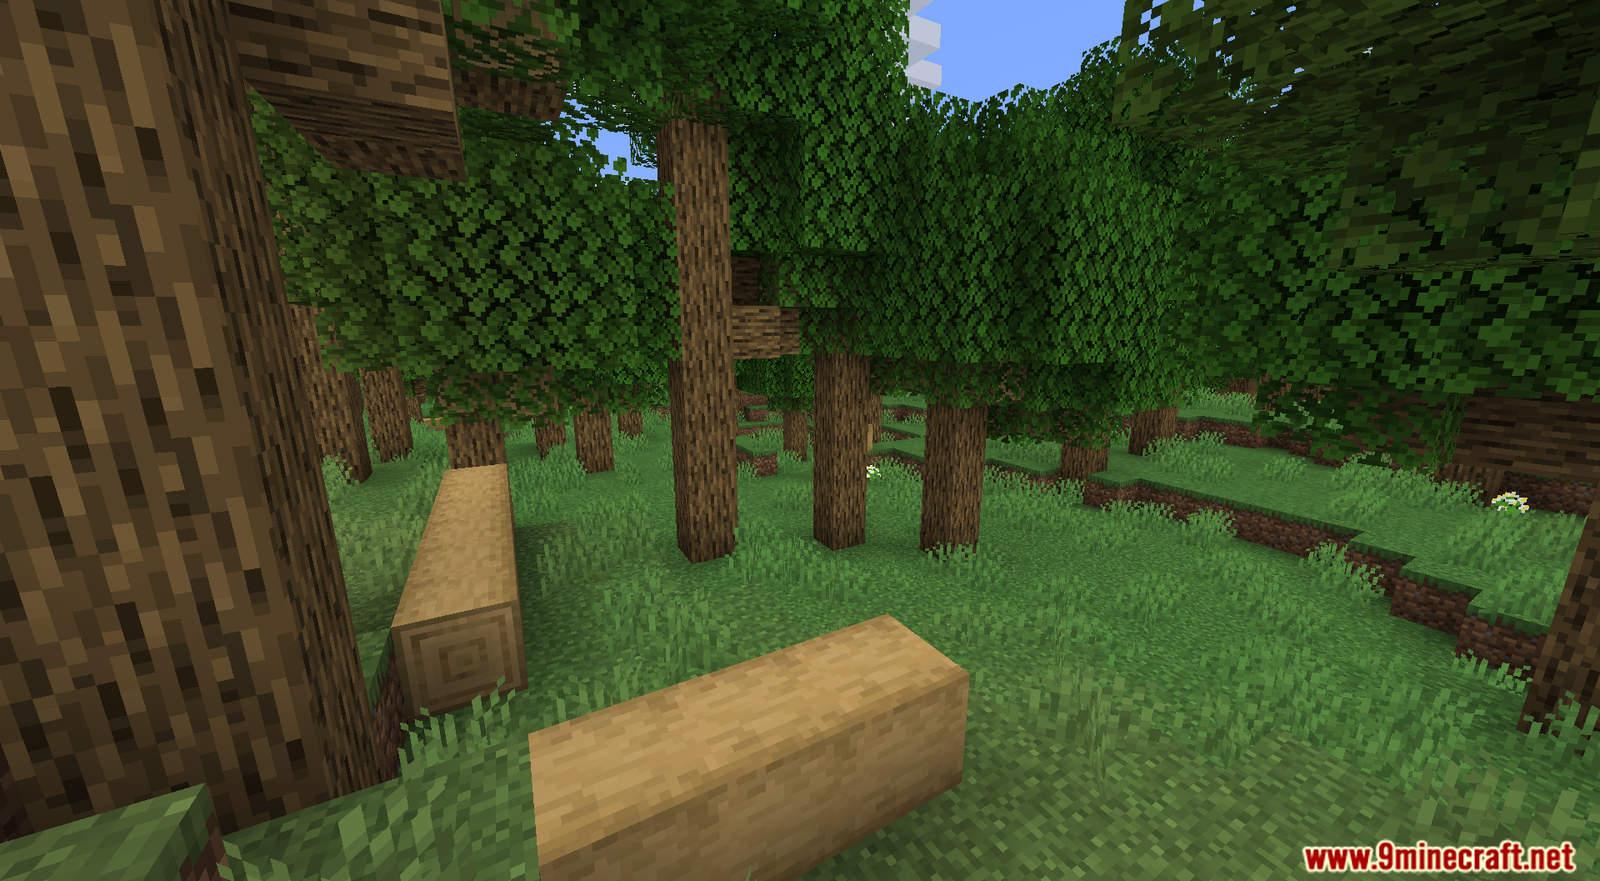 William Wythers' Overhauled Overworld Mod for Minecraft (2)